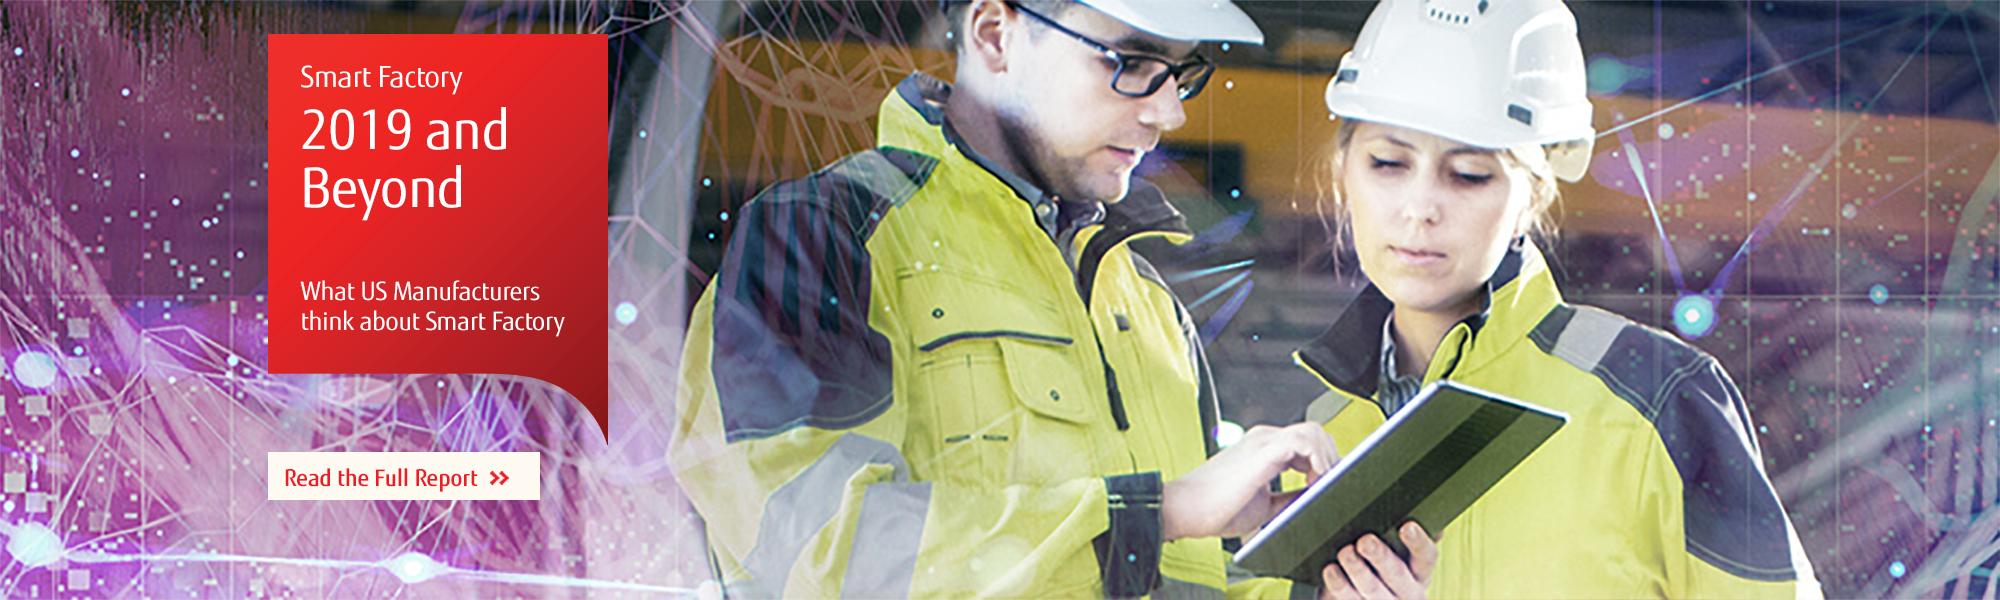 Fujitsu Smart Factory 2019 and Beyond